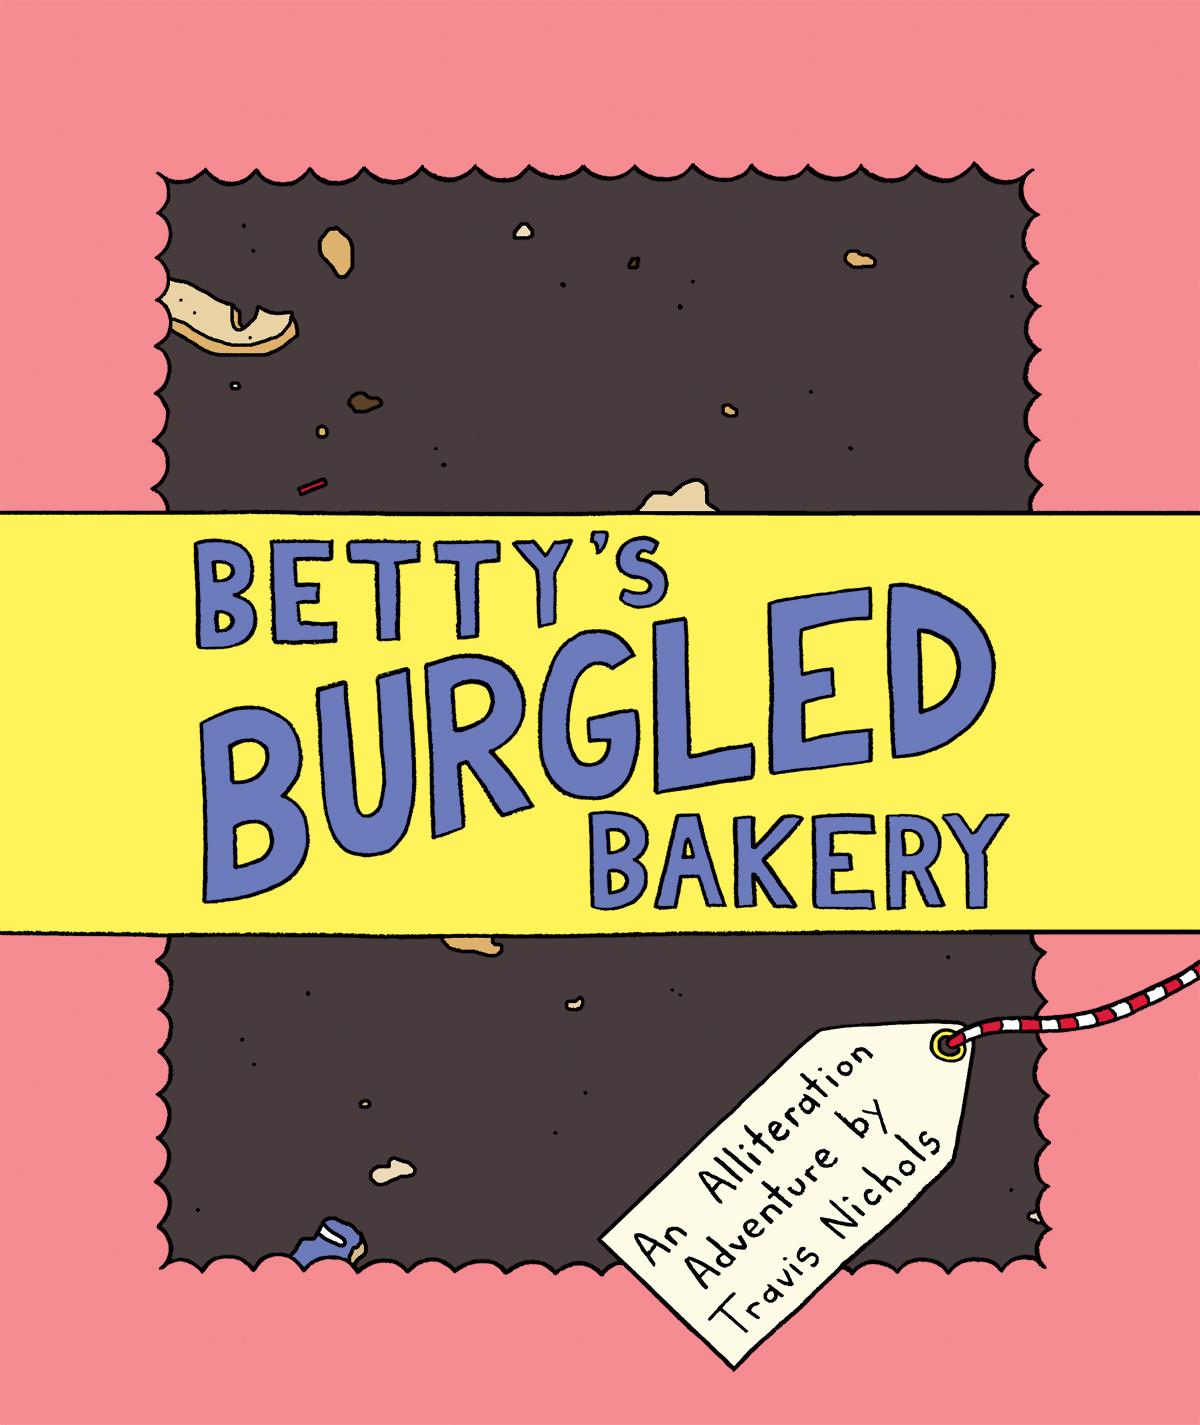 Betty's Burgled Bakery by Travis Nichols